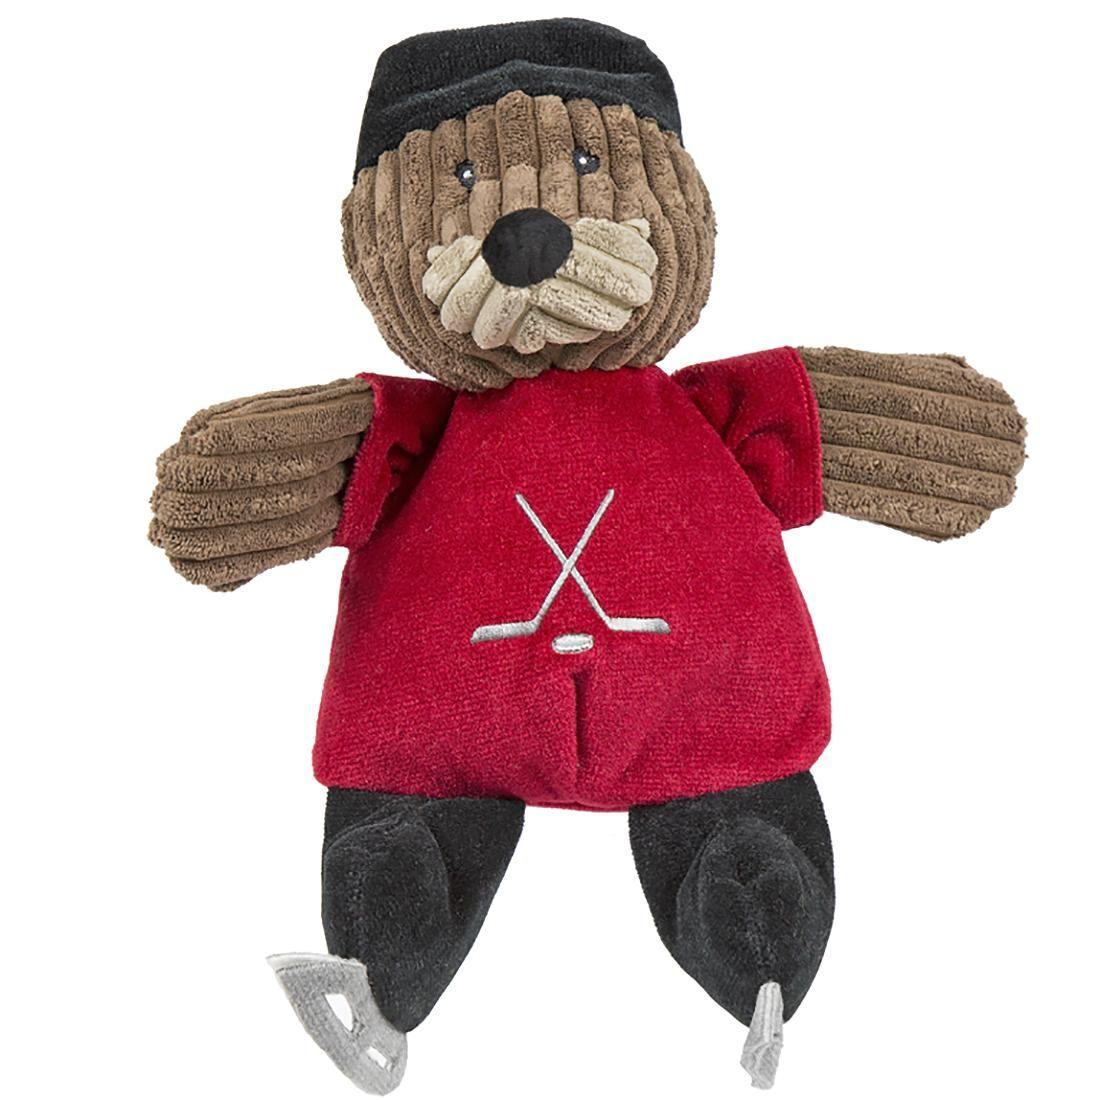 Hugglehounds Chubbie Buddie Plush Dog Toy Fox Hockey Player